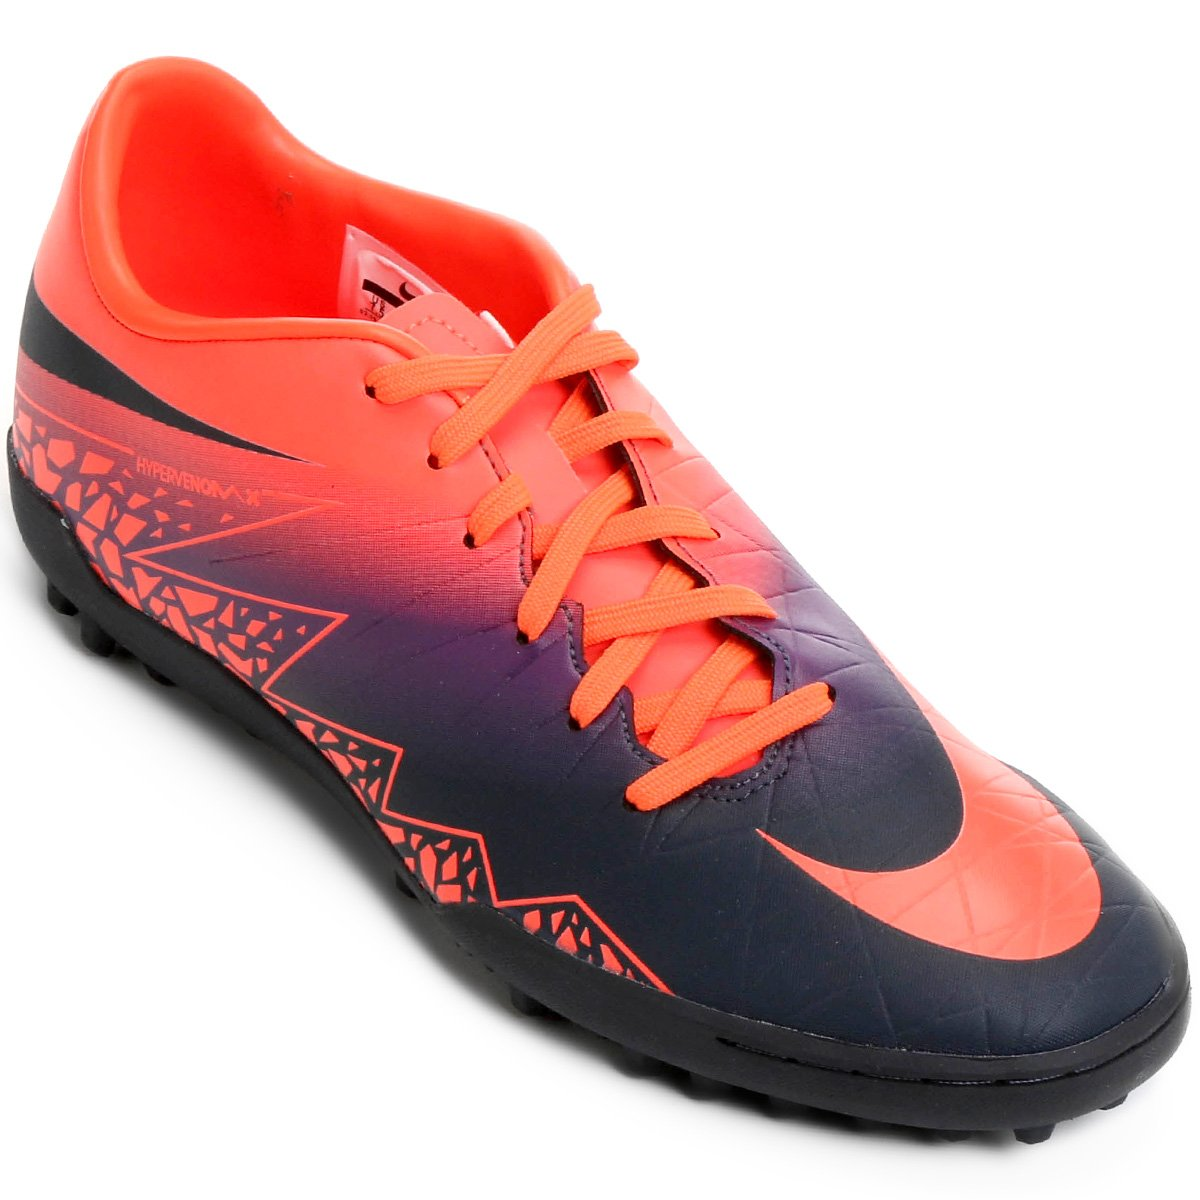 Chuteira Society Nike Hypervenom Phelon 2 TF - Compre Agora  45a7479e0fab2